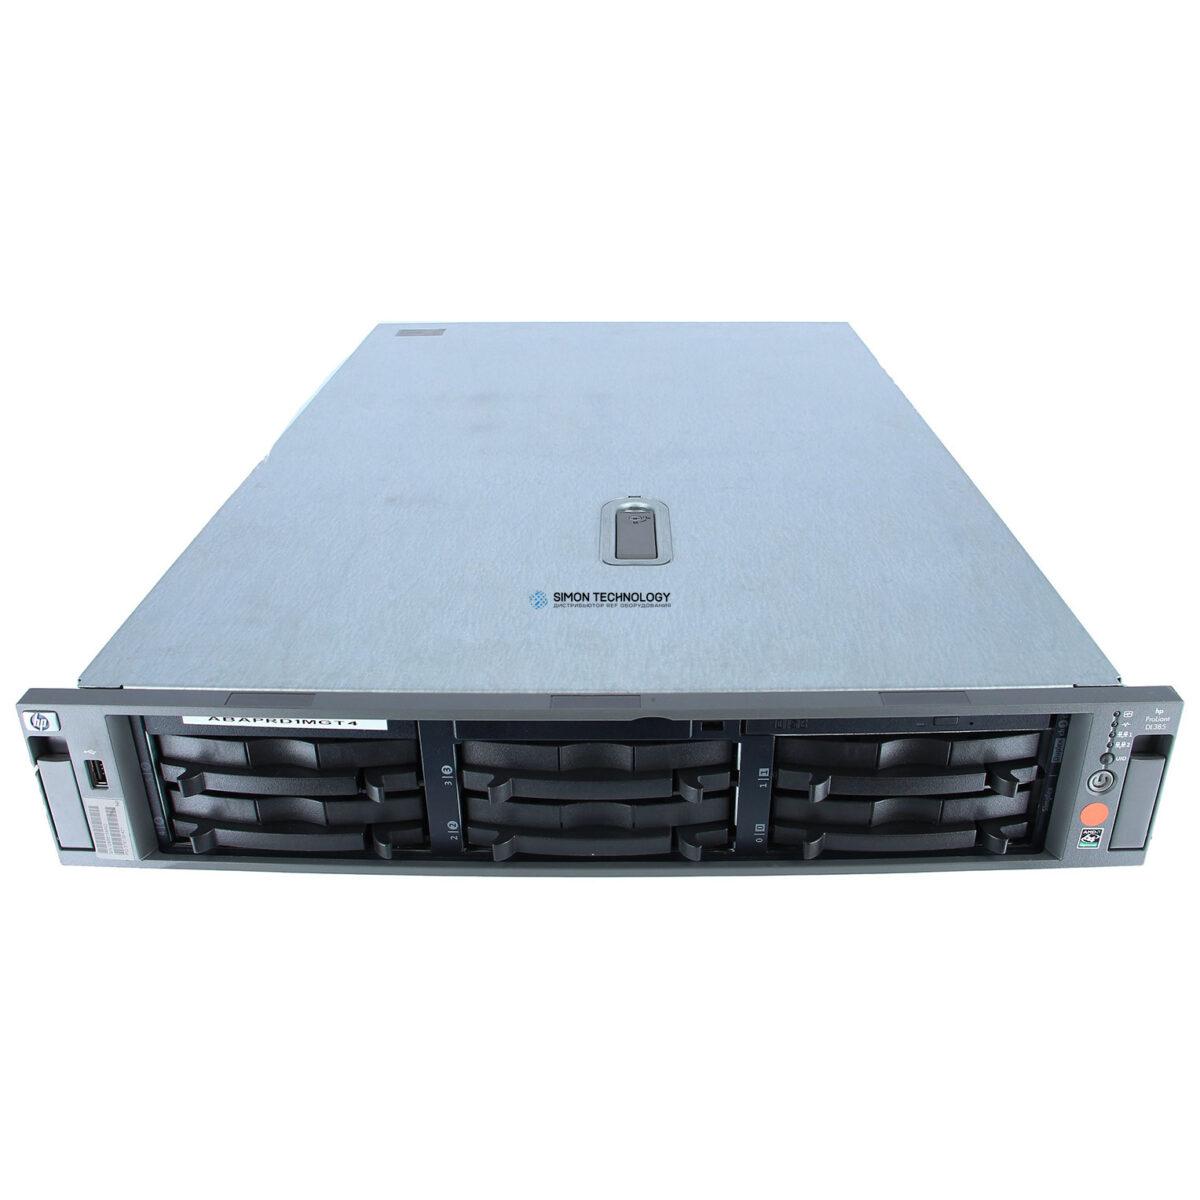 Сервер HP SERVER 2X FAN, 2X 2.4GHZ CPU, 2X PSU, PCI CAGE (DL385-R01)